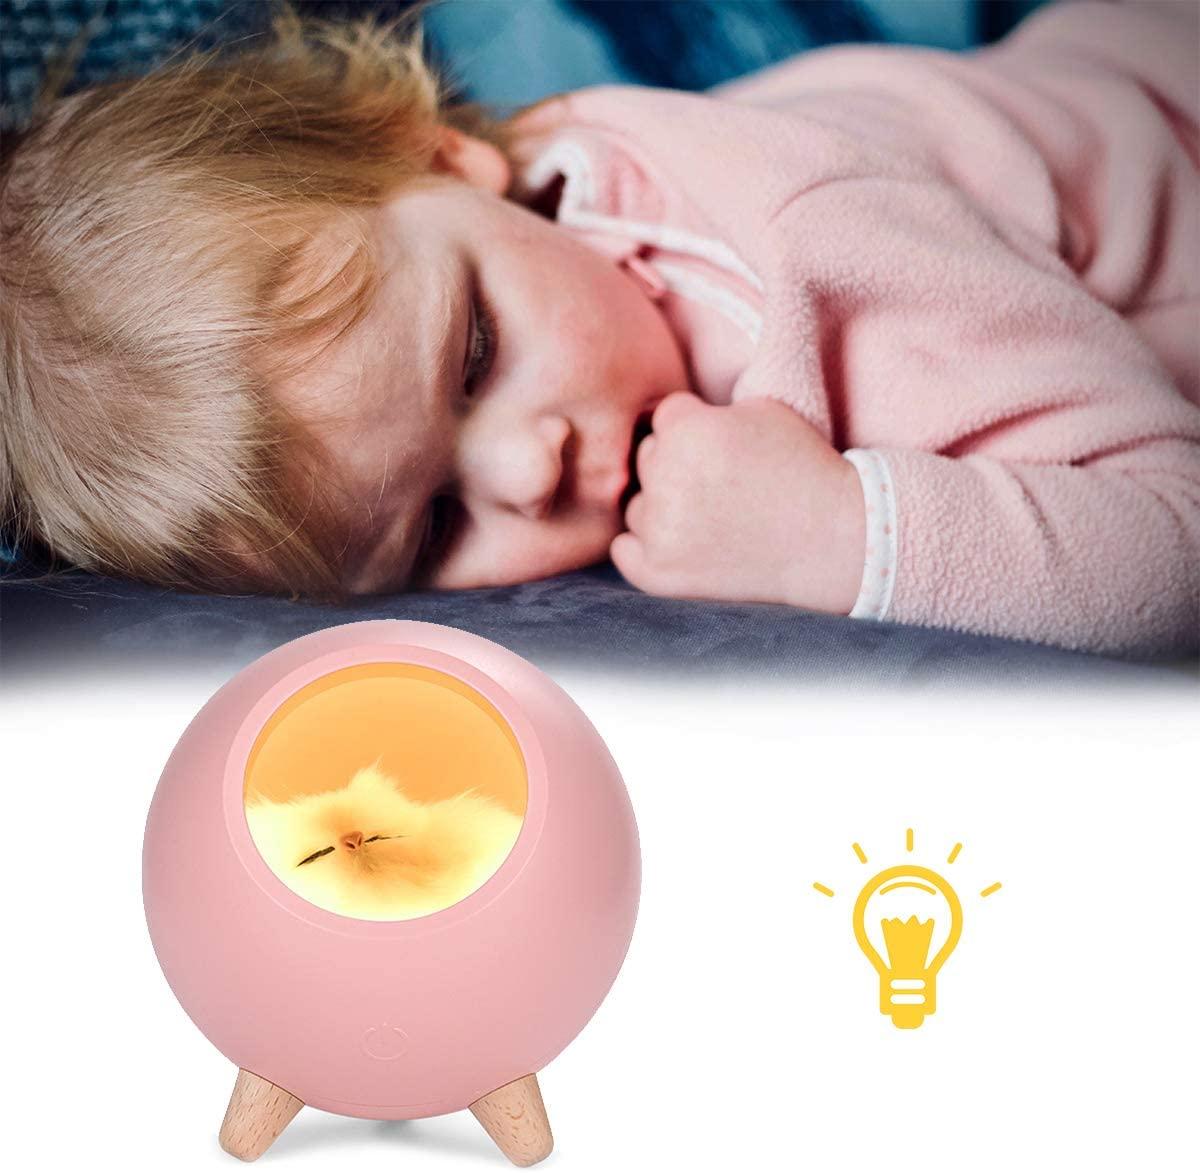 Wallfire Cute Sleeping Cat Night Light Bedroom Light Baby Sleeping Light USB Charging Stepless Dimming Table Bedside Light for Baby/Children/Boy/Girl - Pink